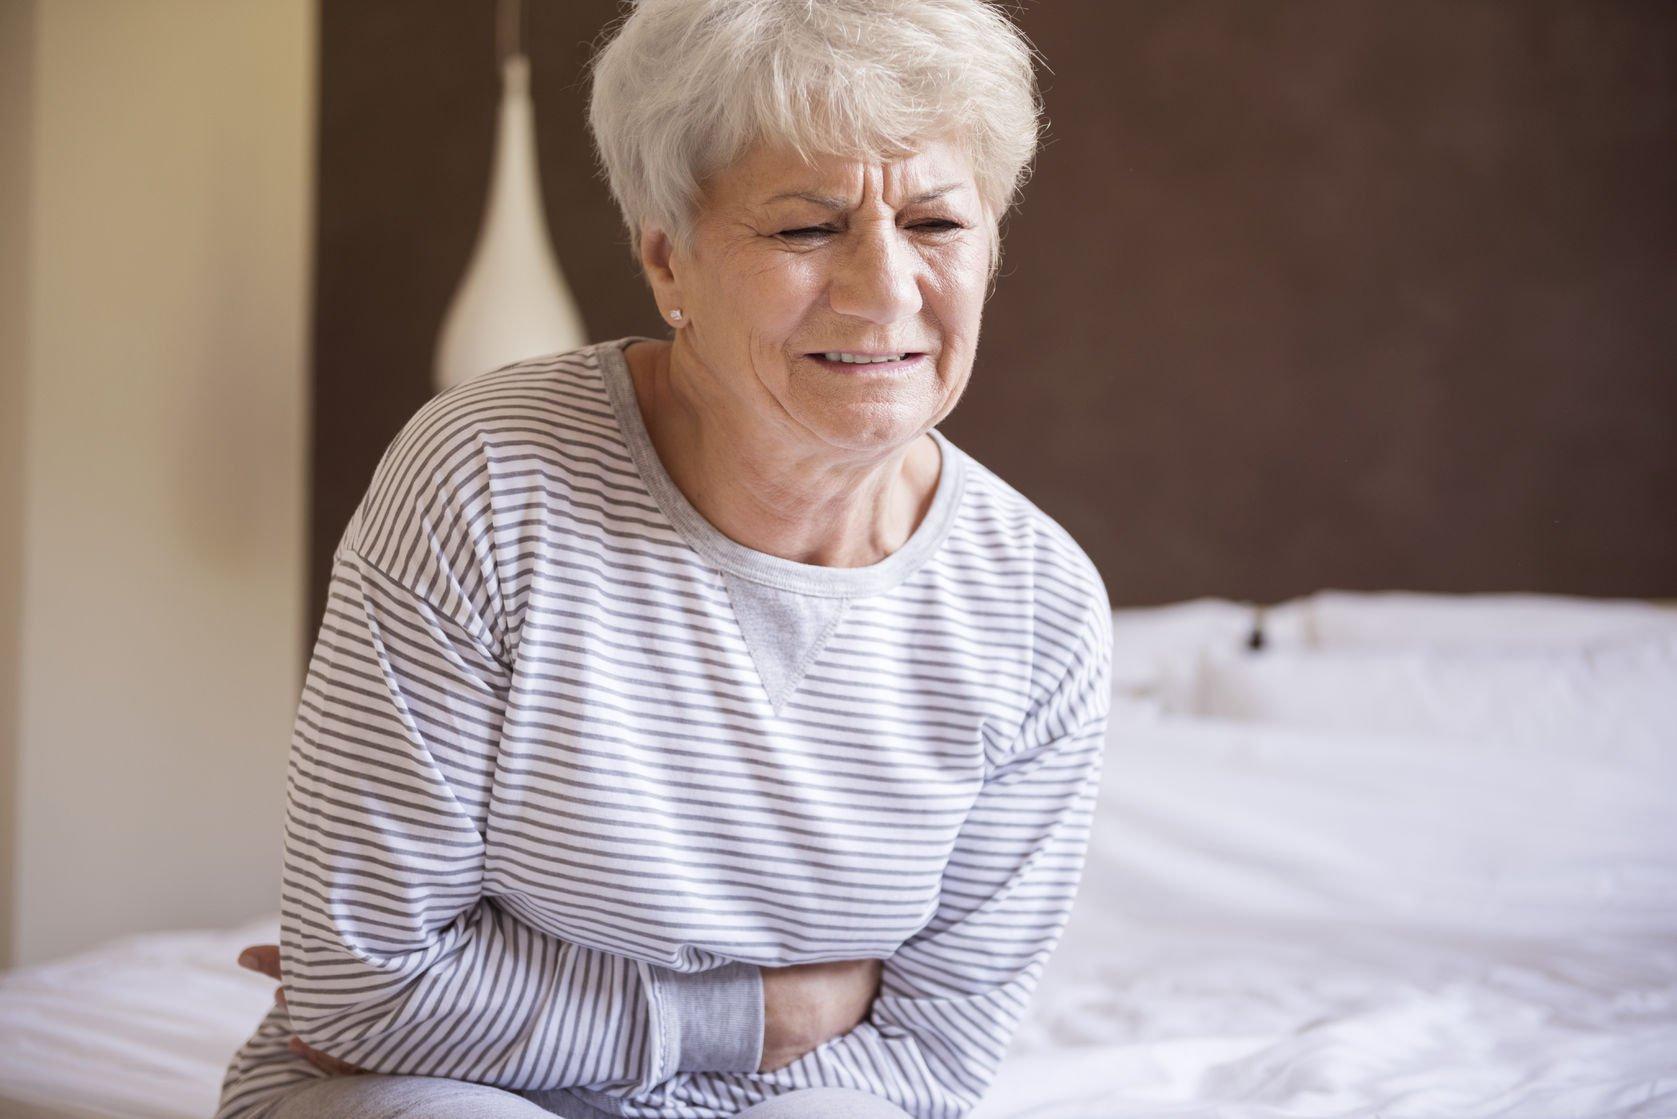 Инфаркт селезенки при тромбозе артерий || Инфаркт селезенки при тромбозе артерий